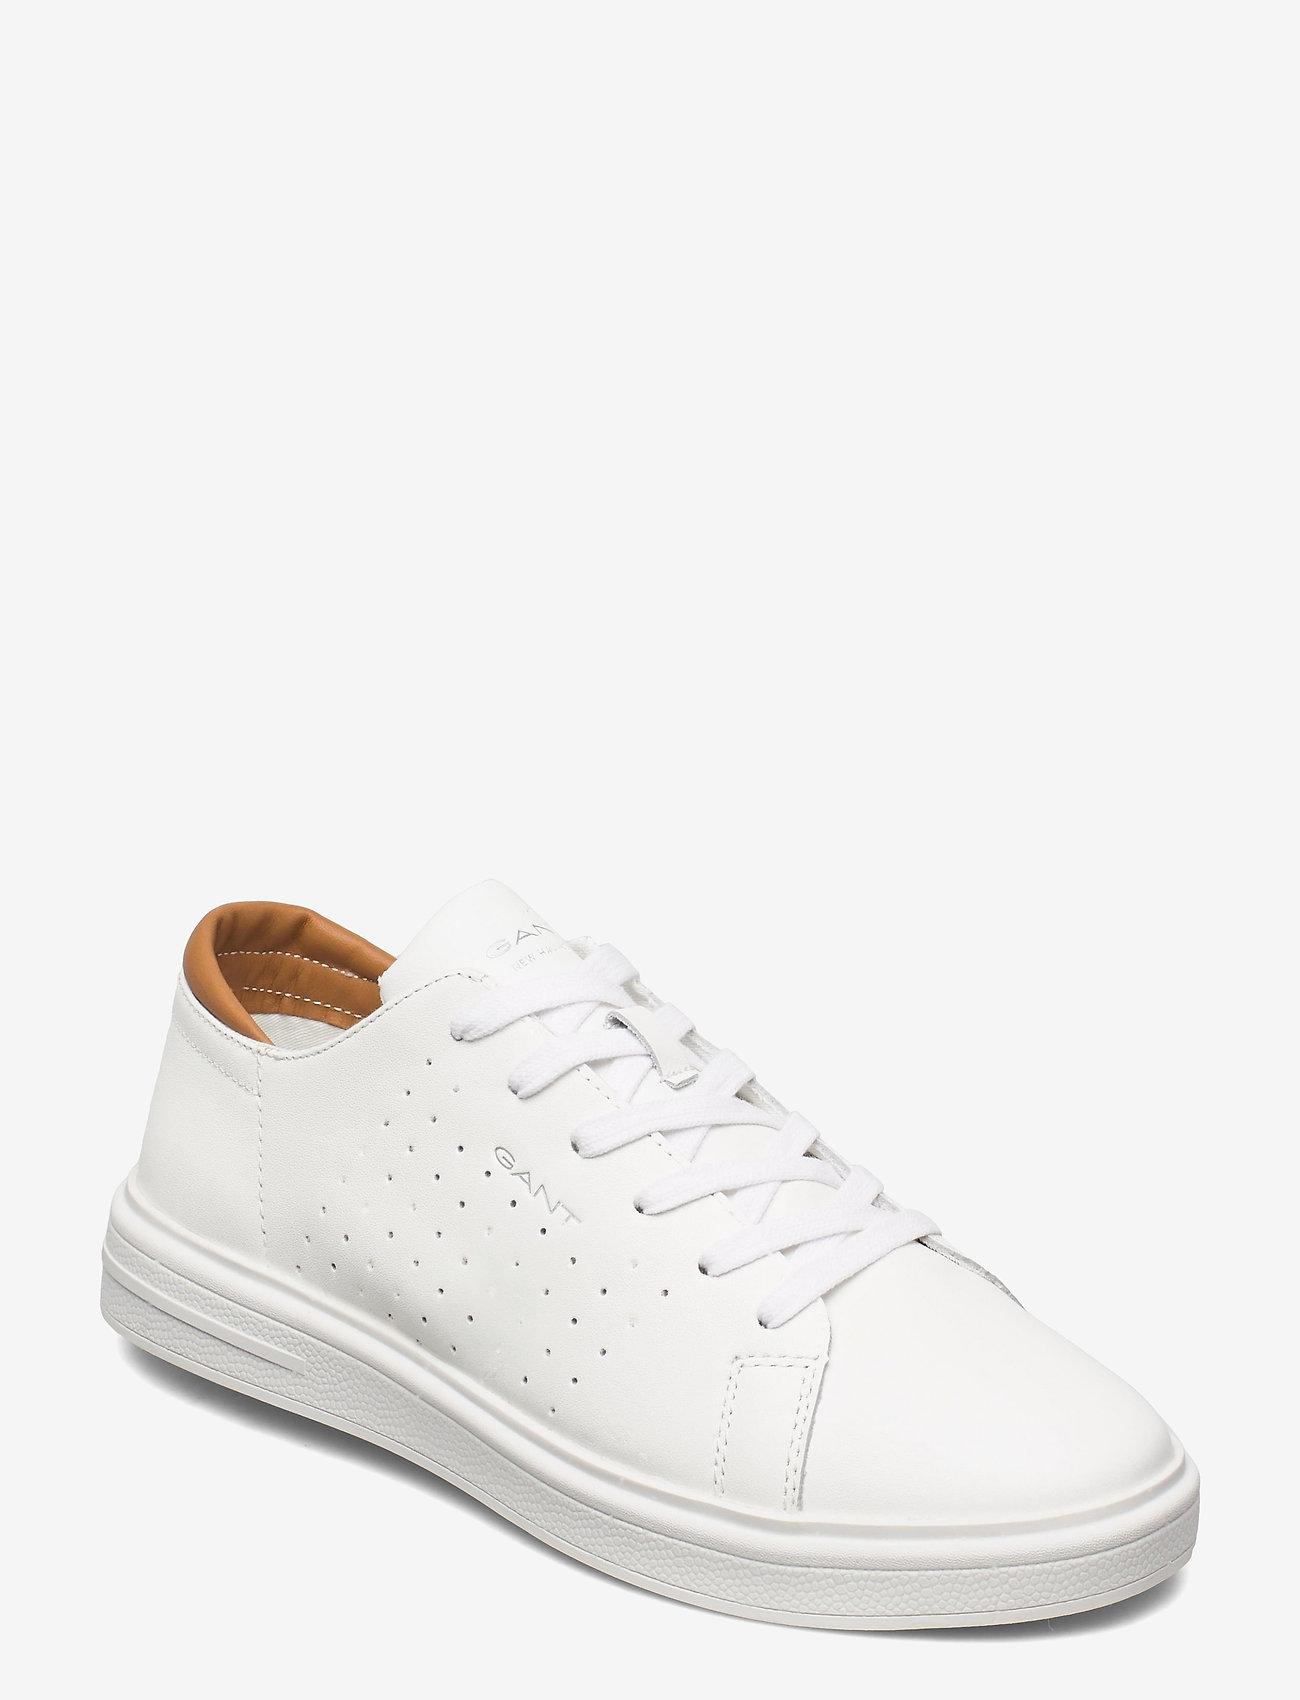 GANT - Fairville Low lace s - low tops - white - 0